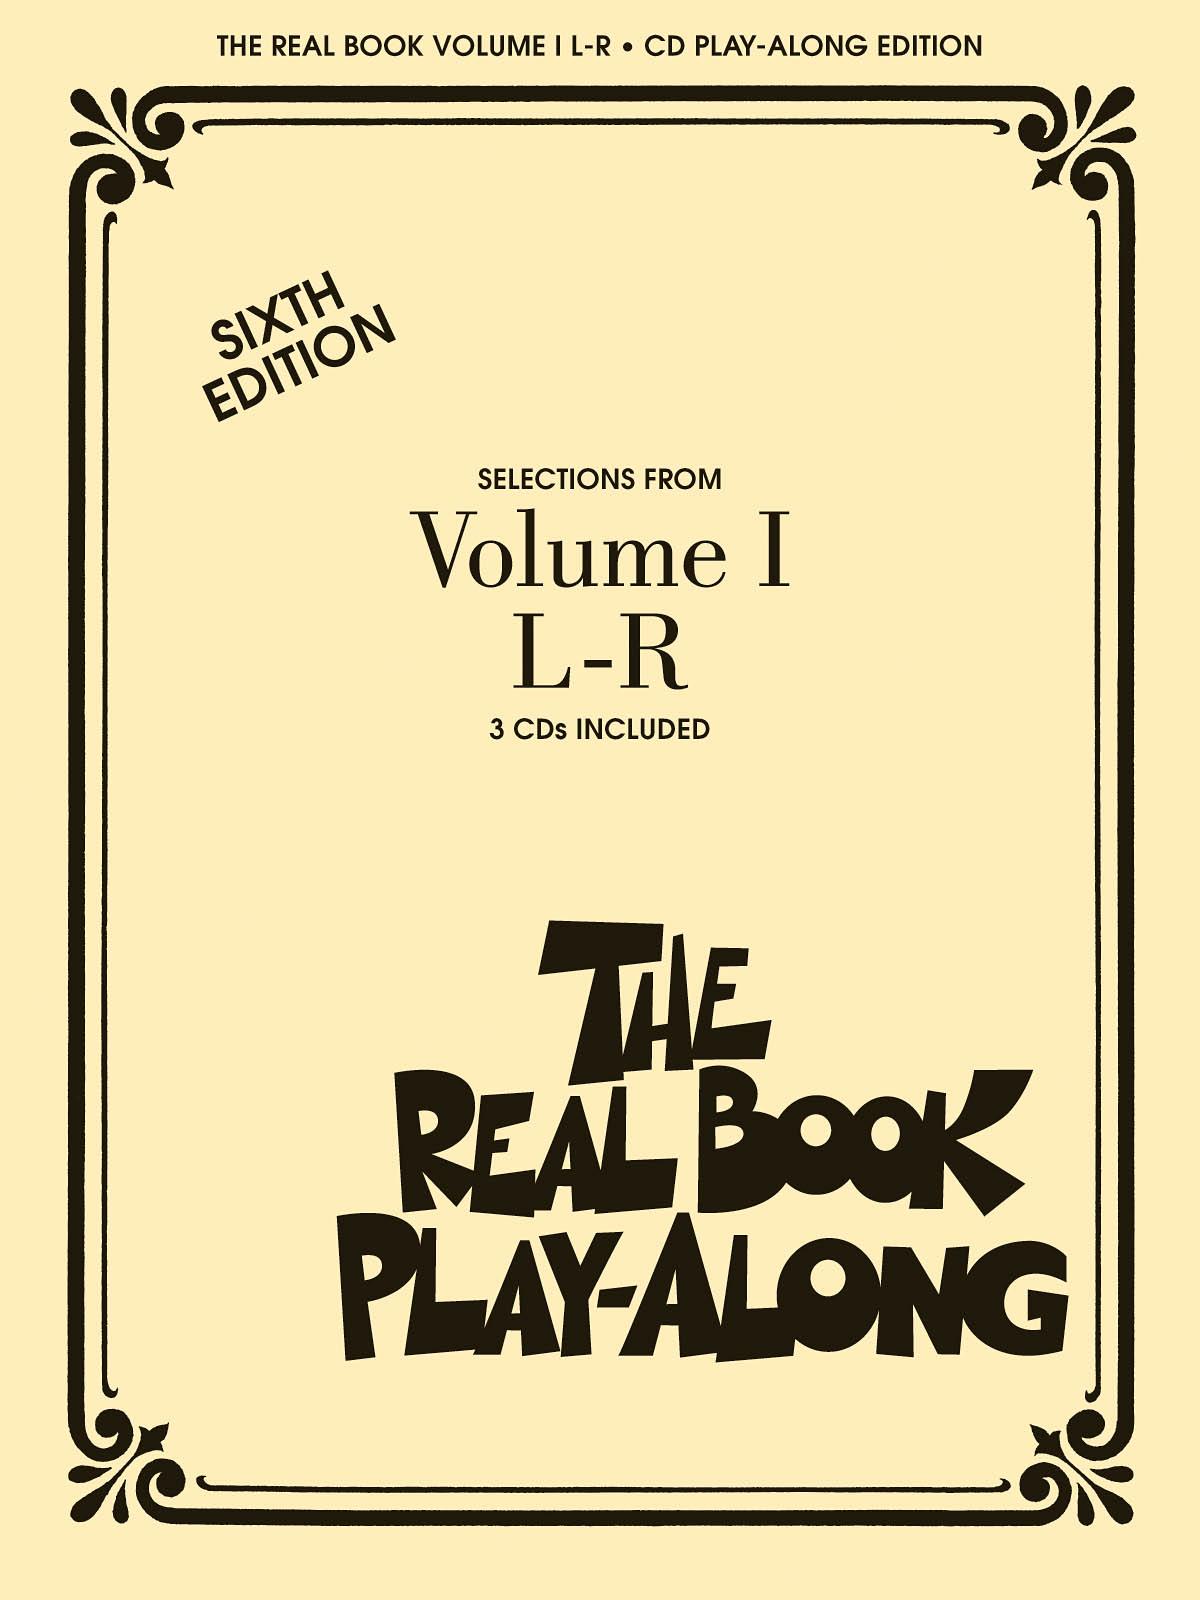 Real Book Play-Along Vol.1 L-R